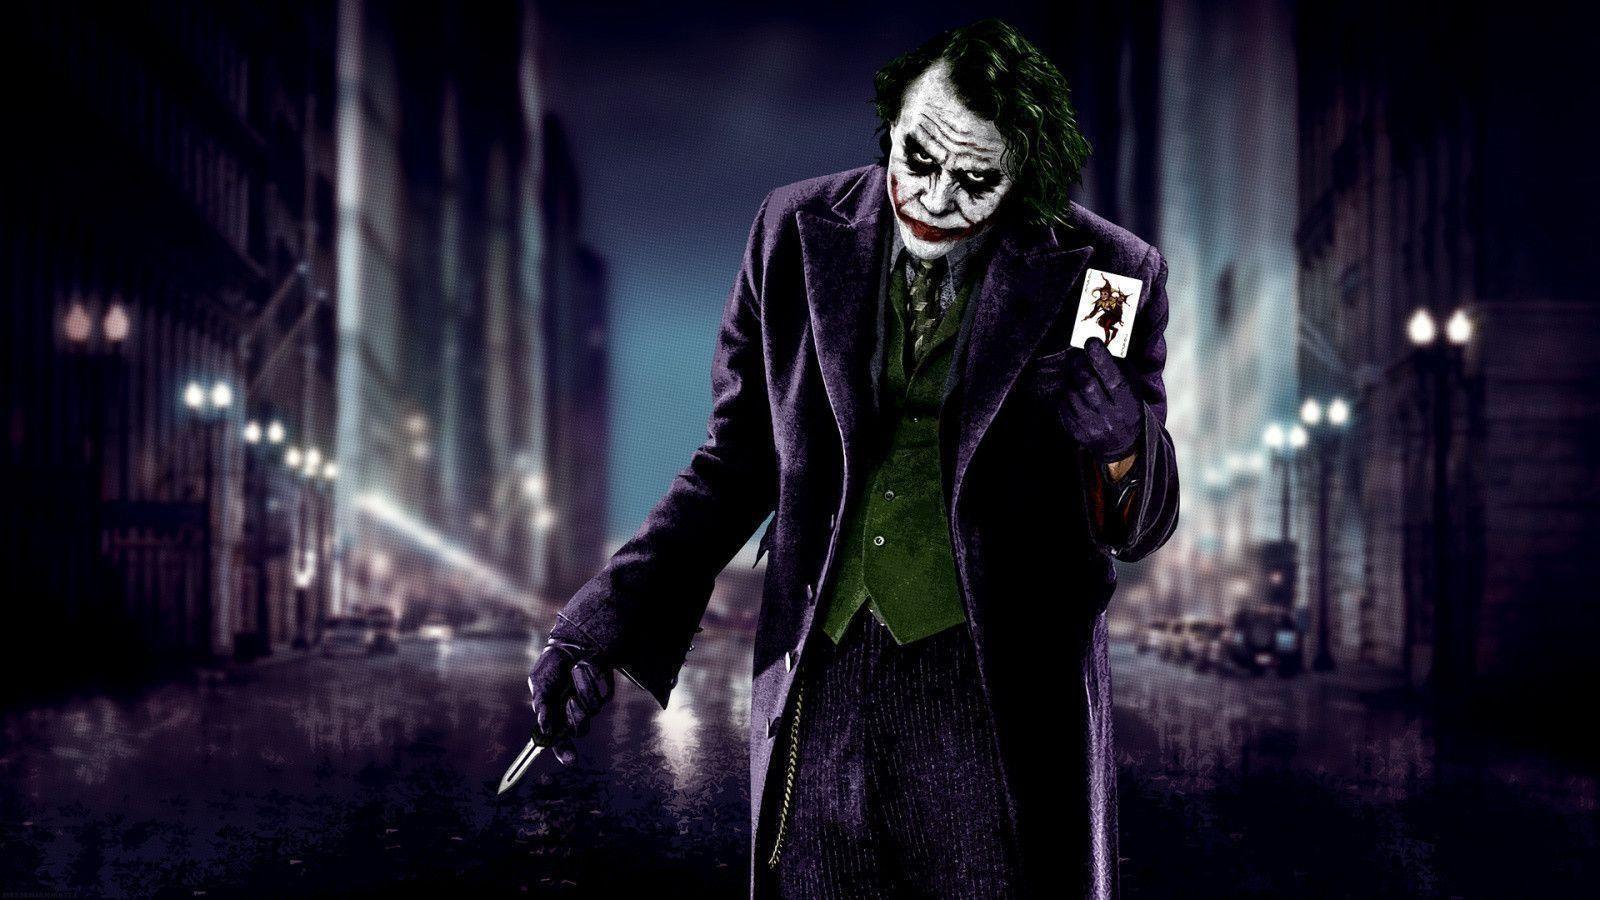 10 Latest Joker Wallpaper Dark Knight Full Hd 1080p For Pc Background Joker Joker Disfraz Joker Batman